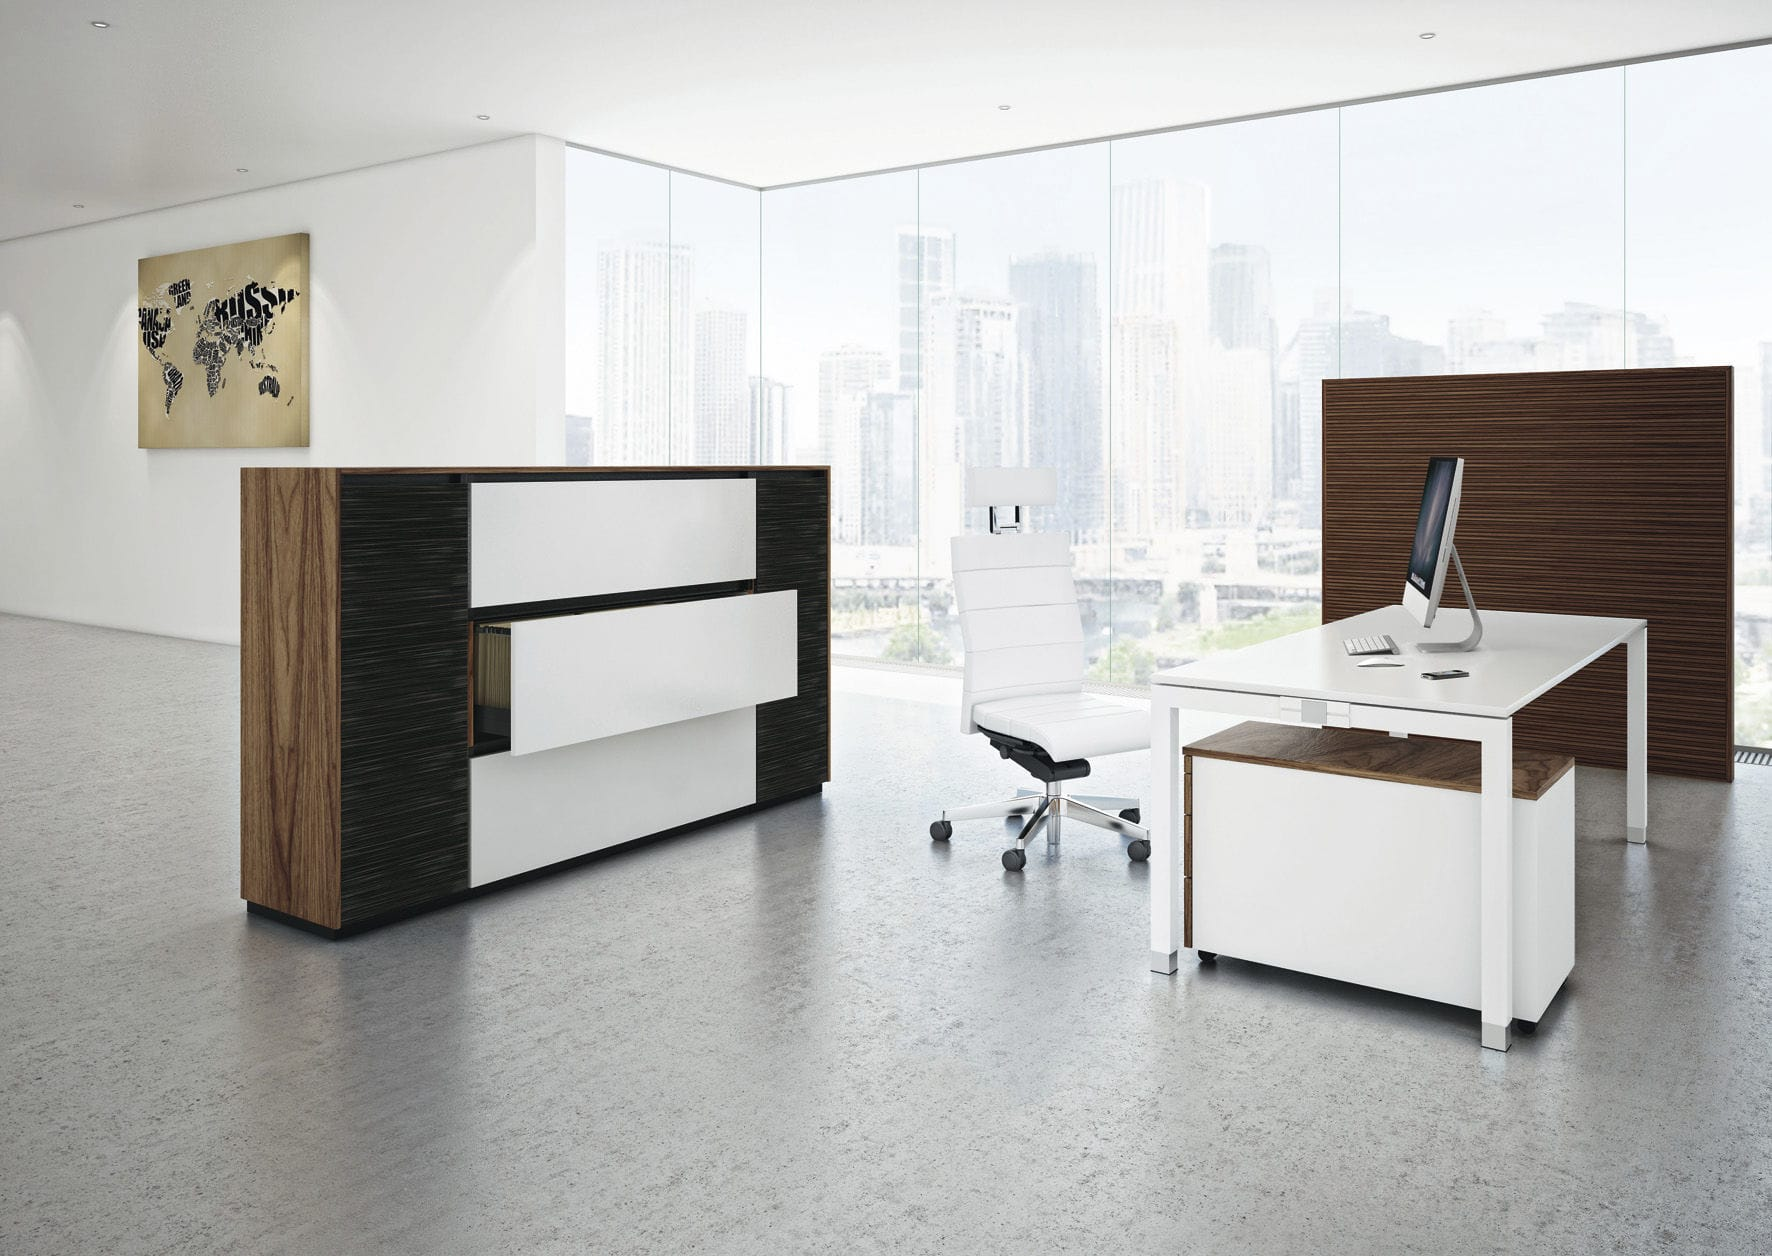 Modul Bibliothek / modern / für Büro / Holz - INTAVIS - ASSMANN ...